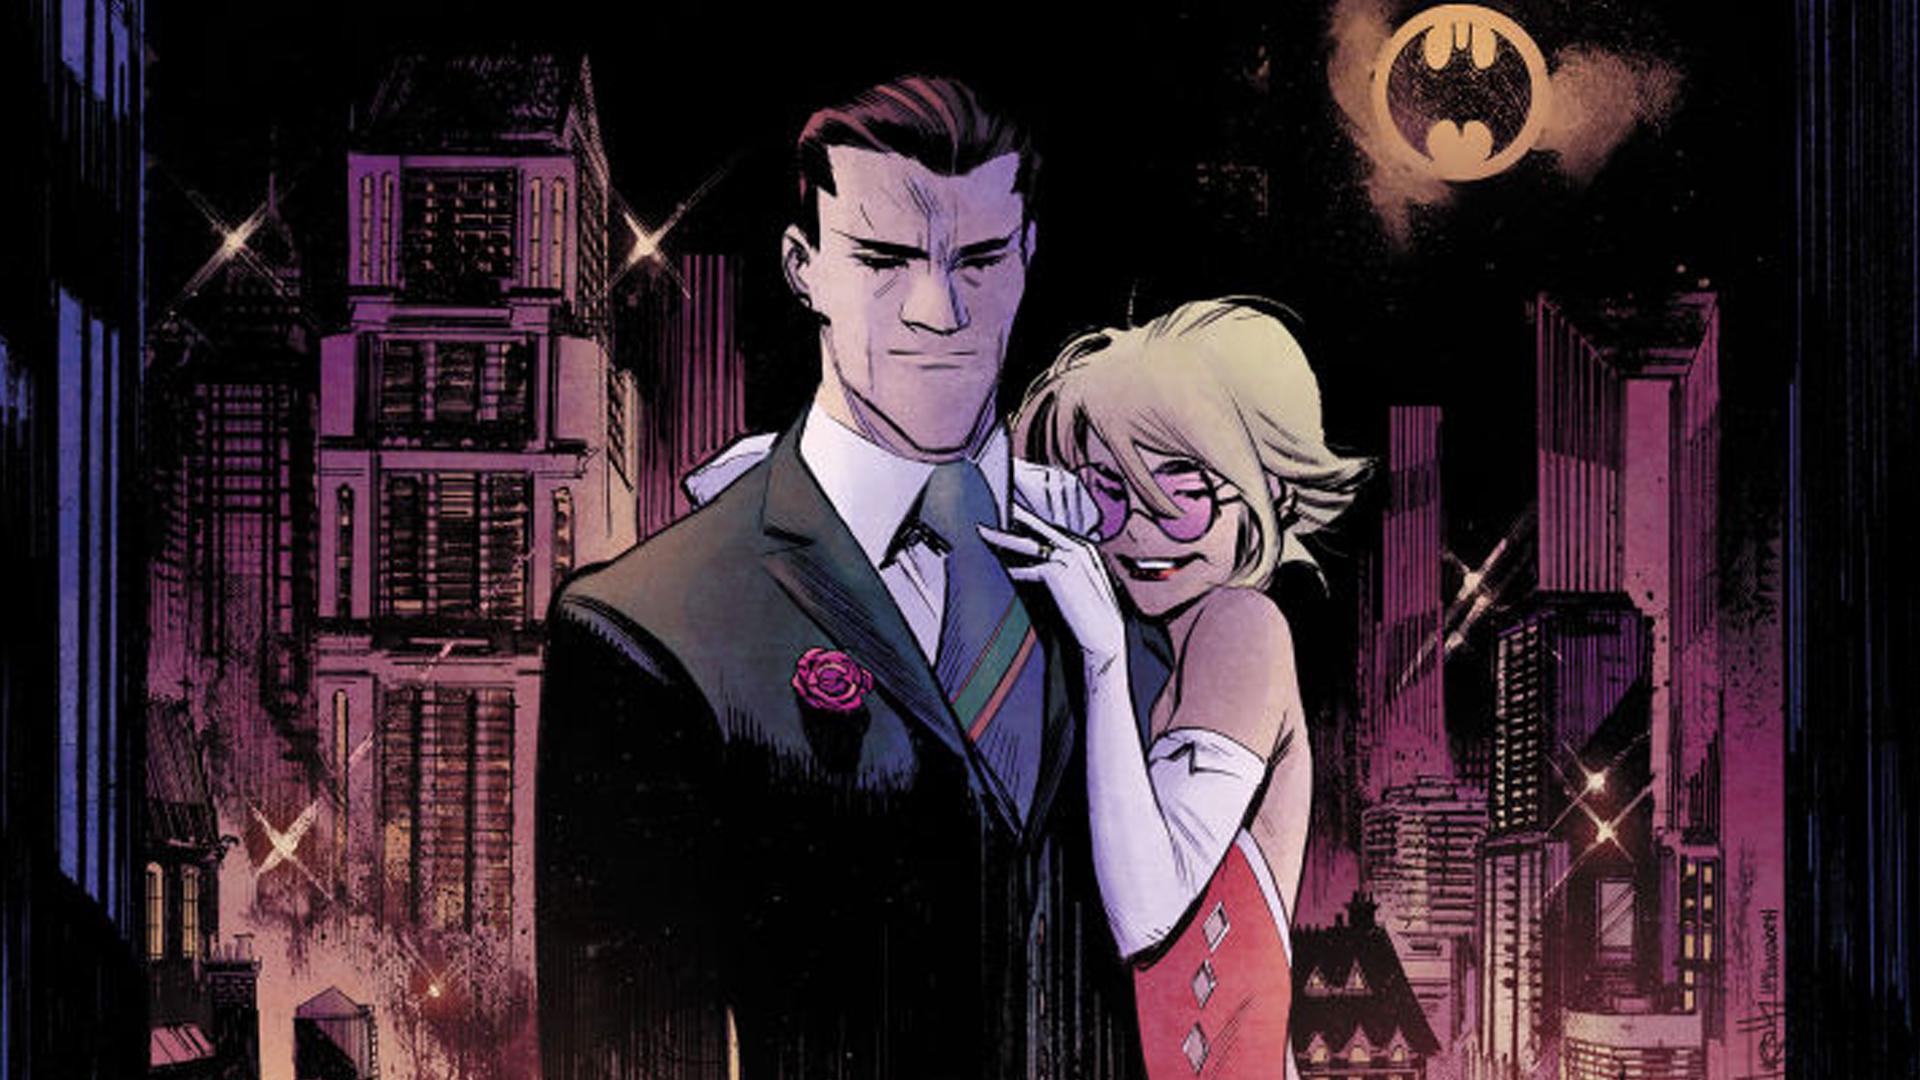 joker is the hero and batman is the villain in new comic batman